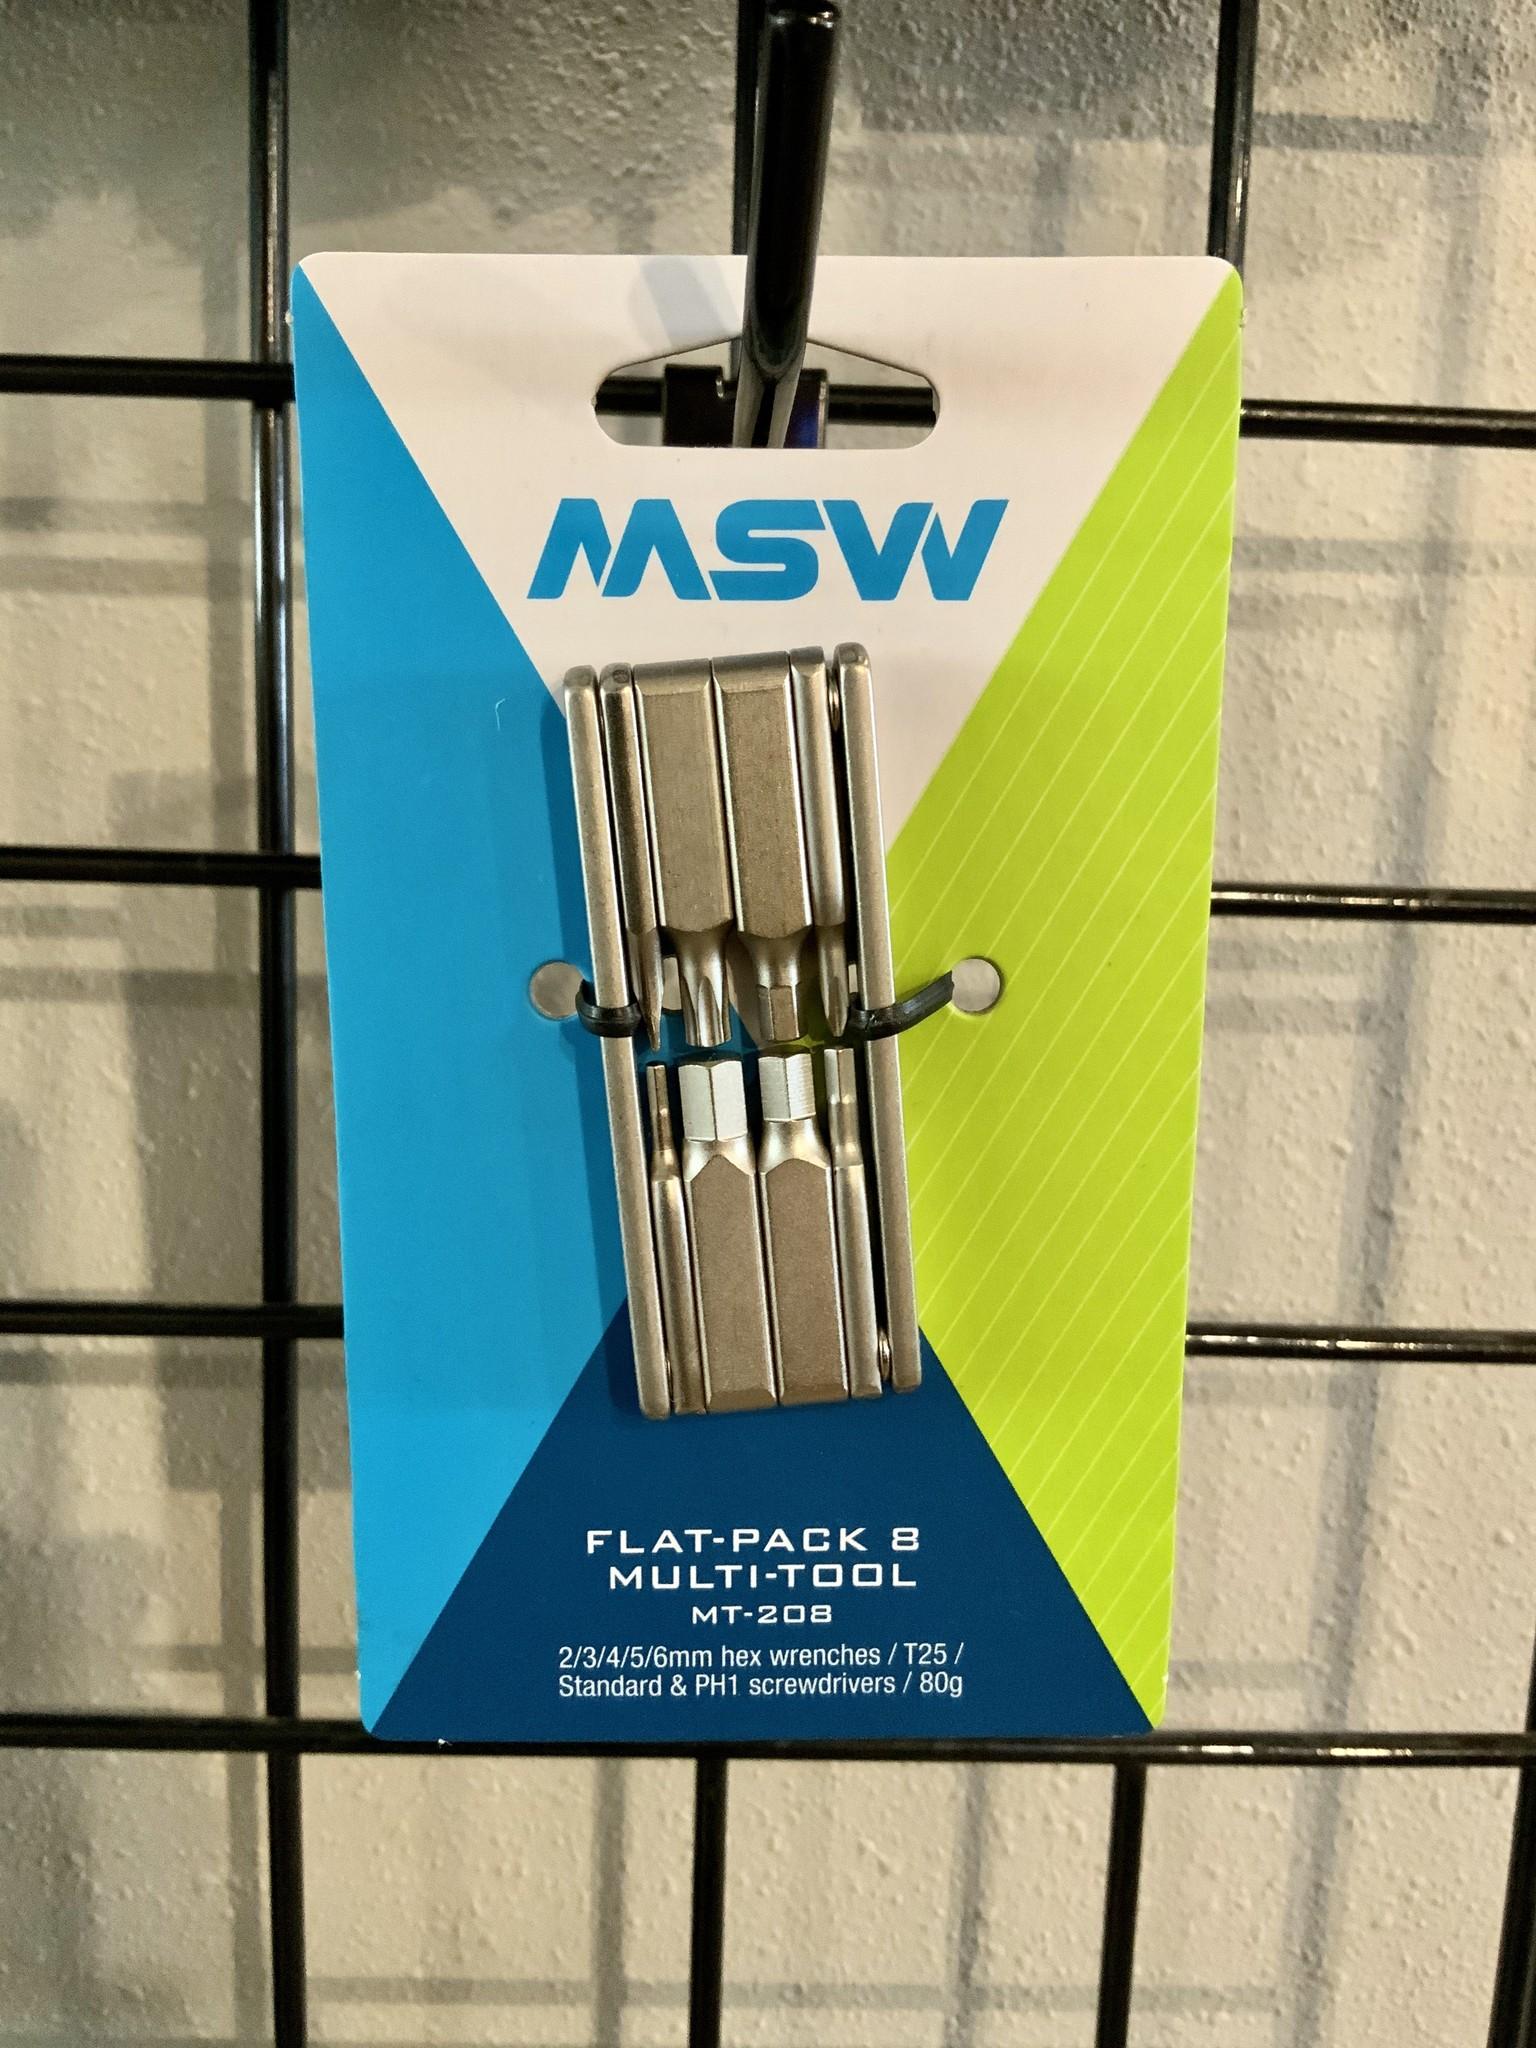 MSW MSW MT-208 Flat-Pack Multi-Tool, 8 Bit